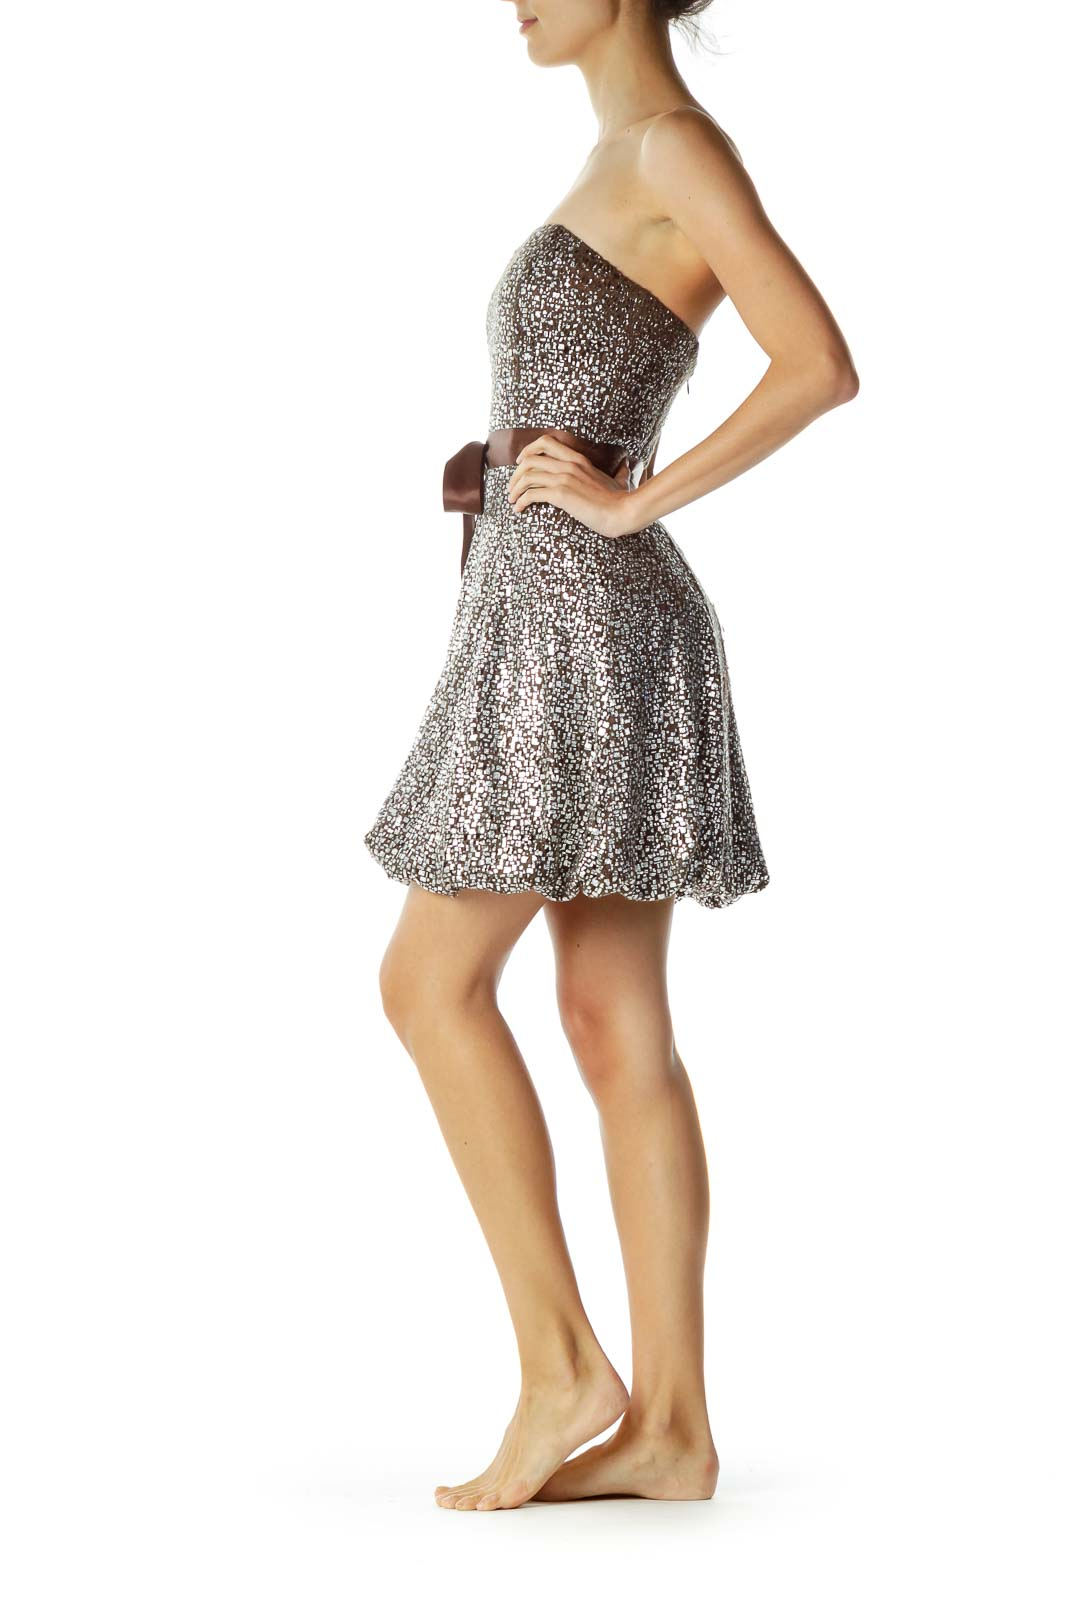 Brown Strapless Cocktail Dress